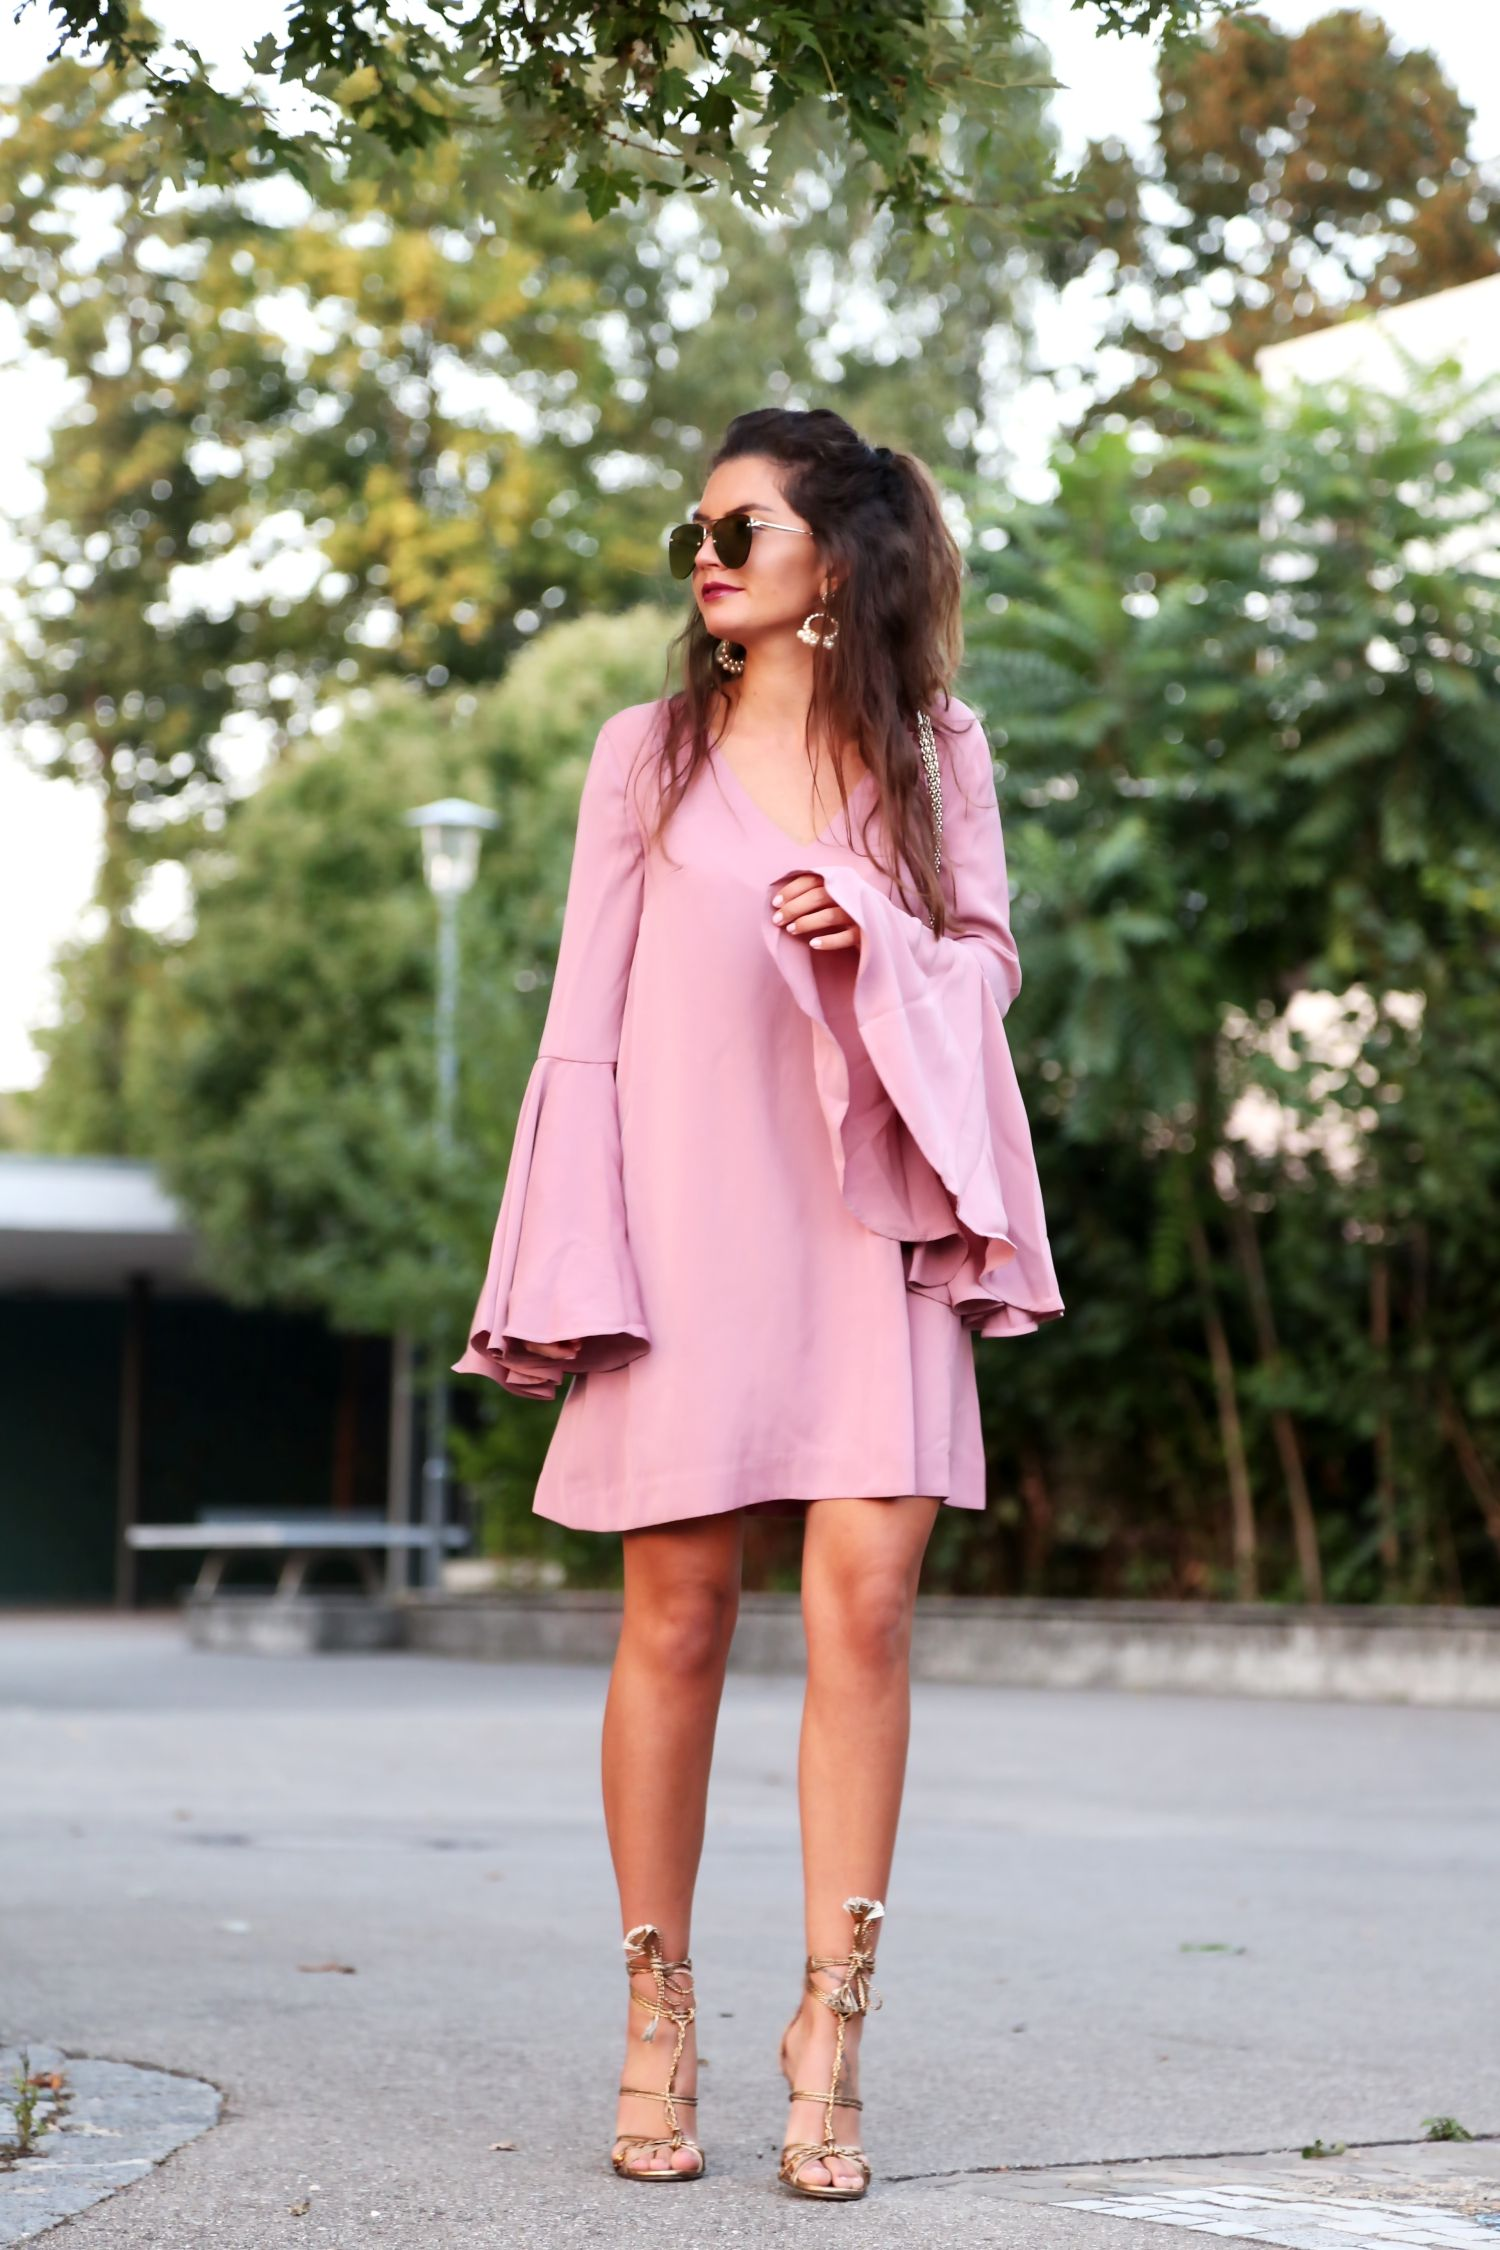 FashionHippieLoves. Pink belt sleeves dress+golden lace up heeled sandals+natural coloured Valentino Lockstud shoulder bag+gold earrings+sunglasses. Summer Date Outfit 2016